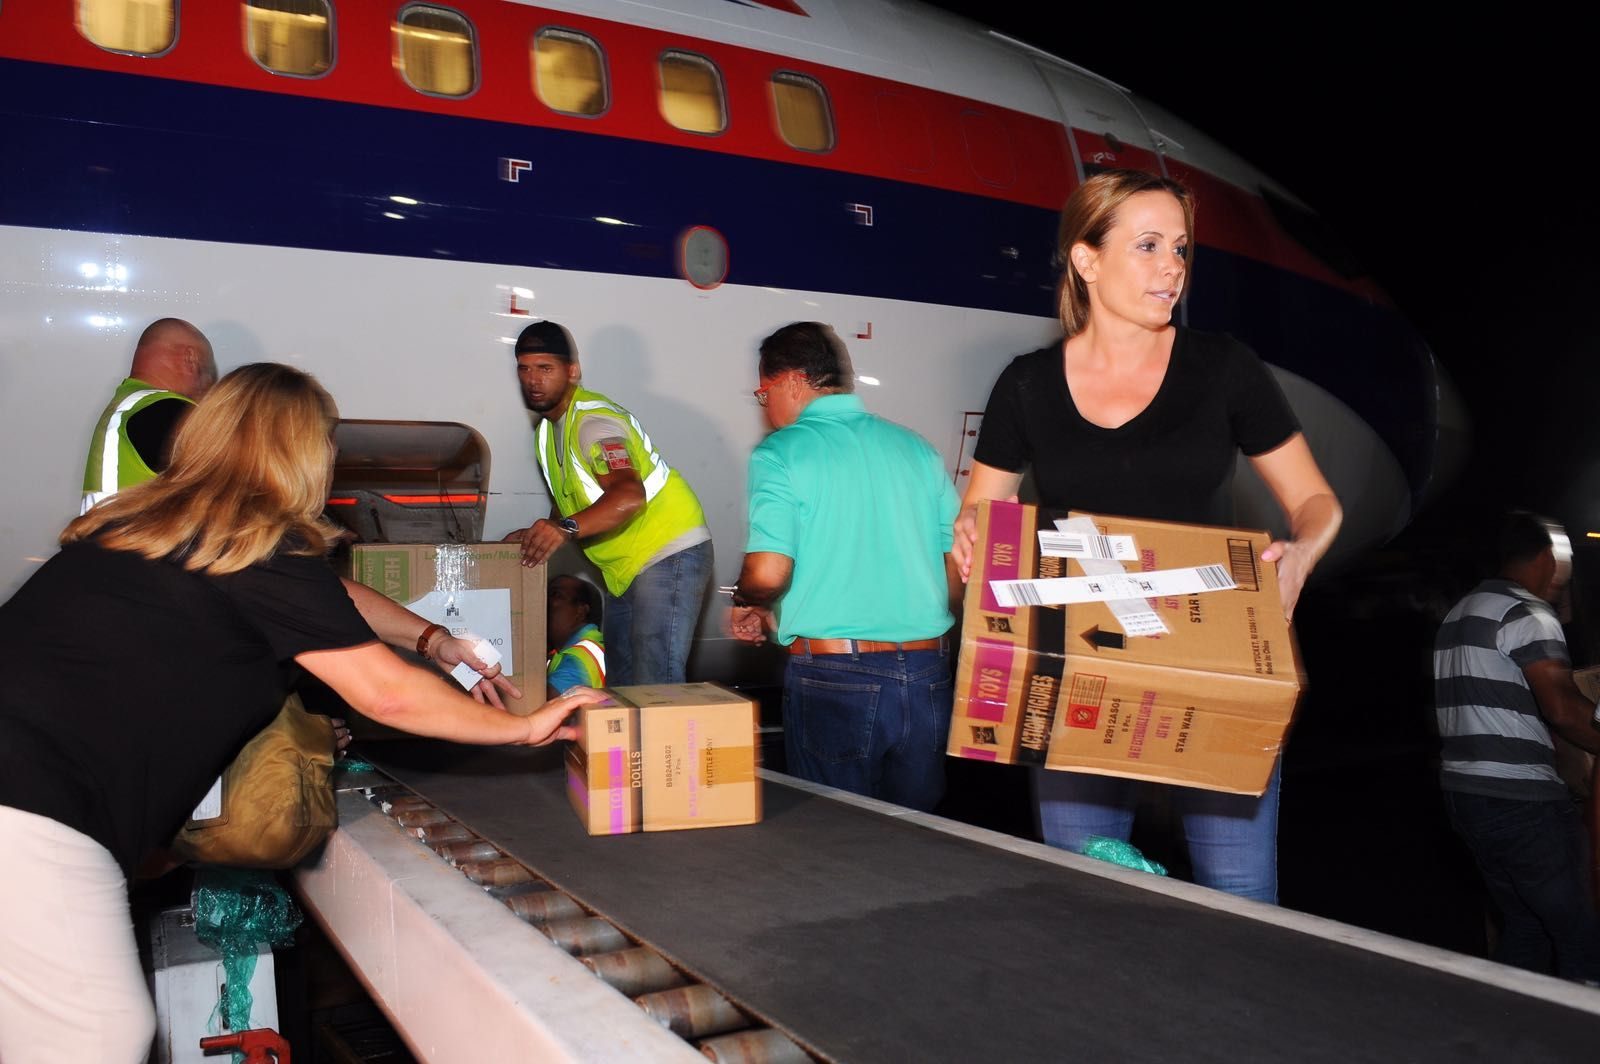 Fotografia Natalia Denegri entrega ayuda humanitaria en Puerto Rico